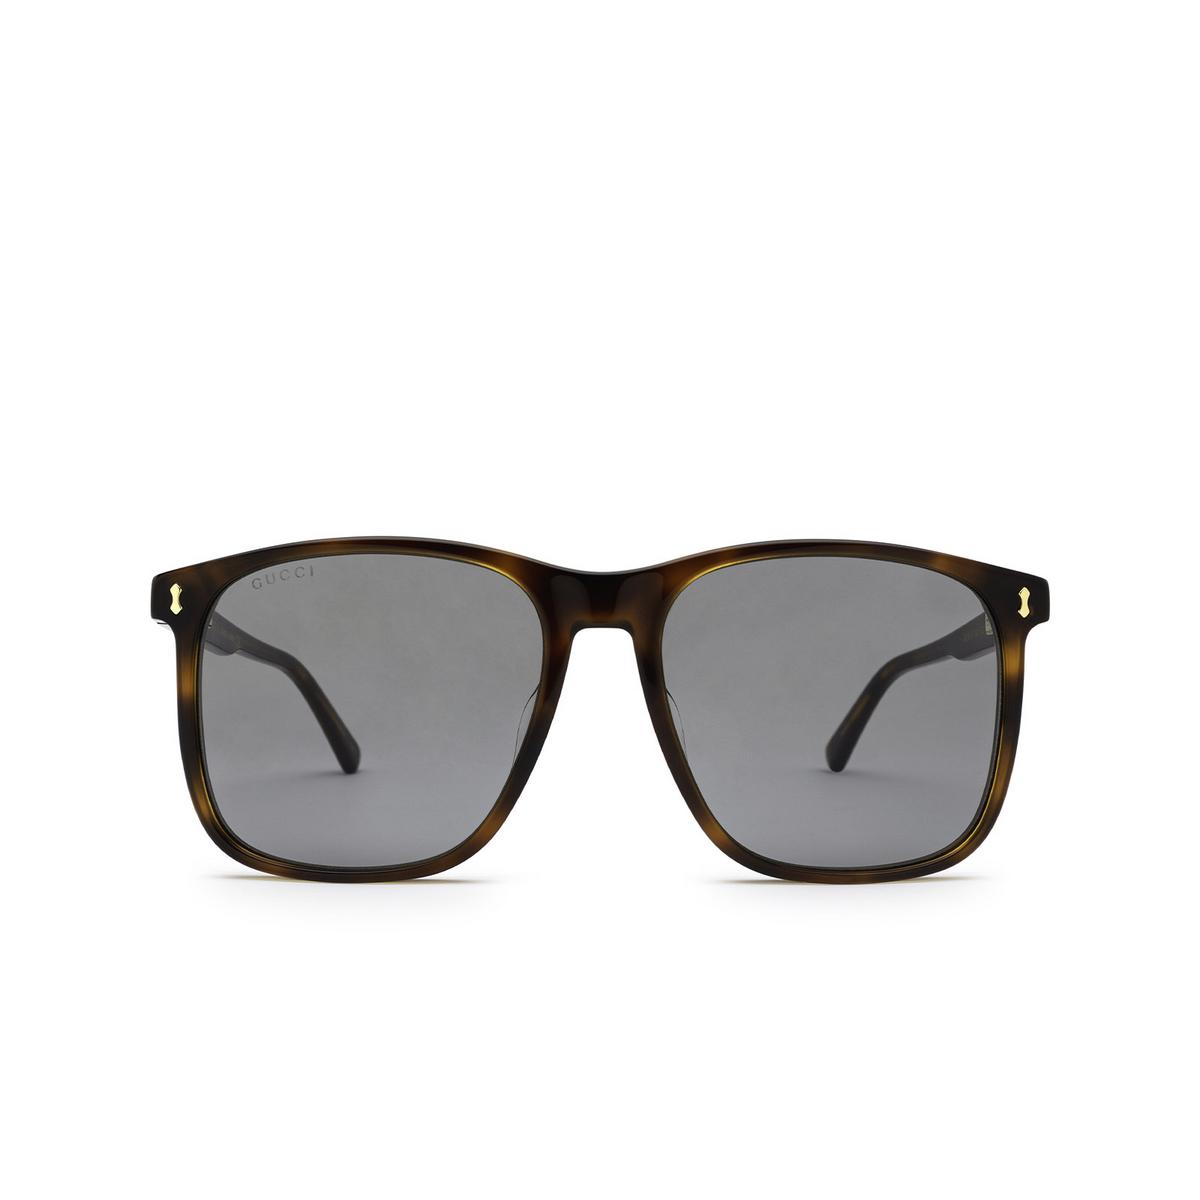 Gucci® Square Sunglasses: GG1041S color Havana 002 - front view.